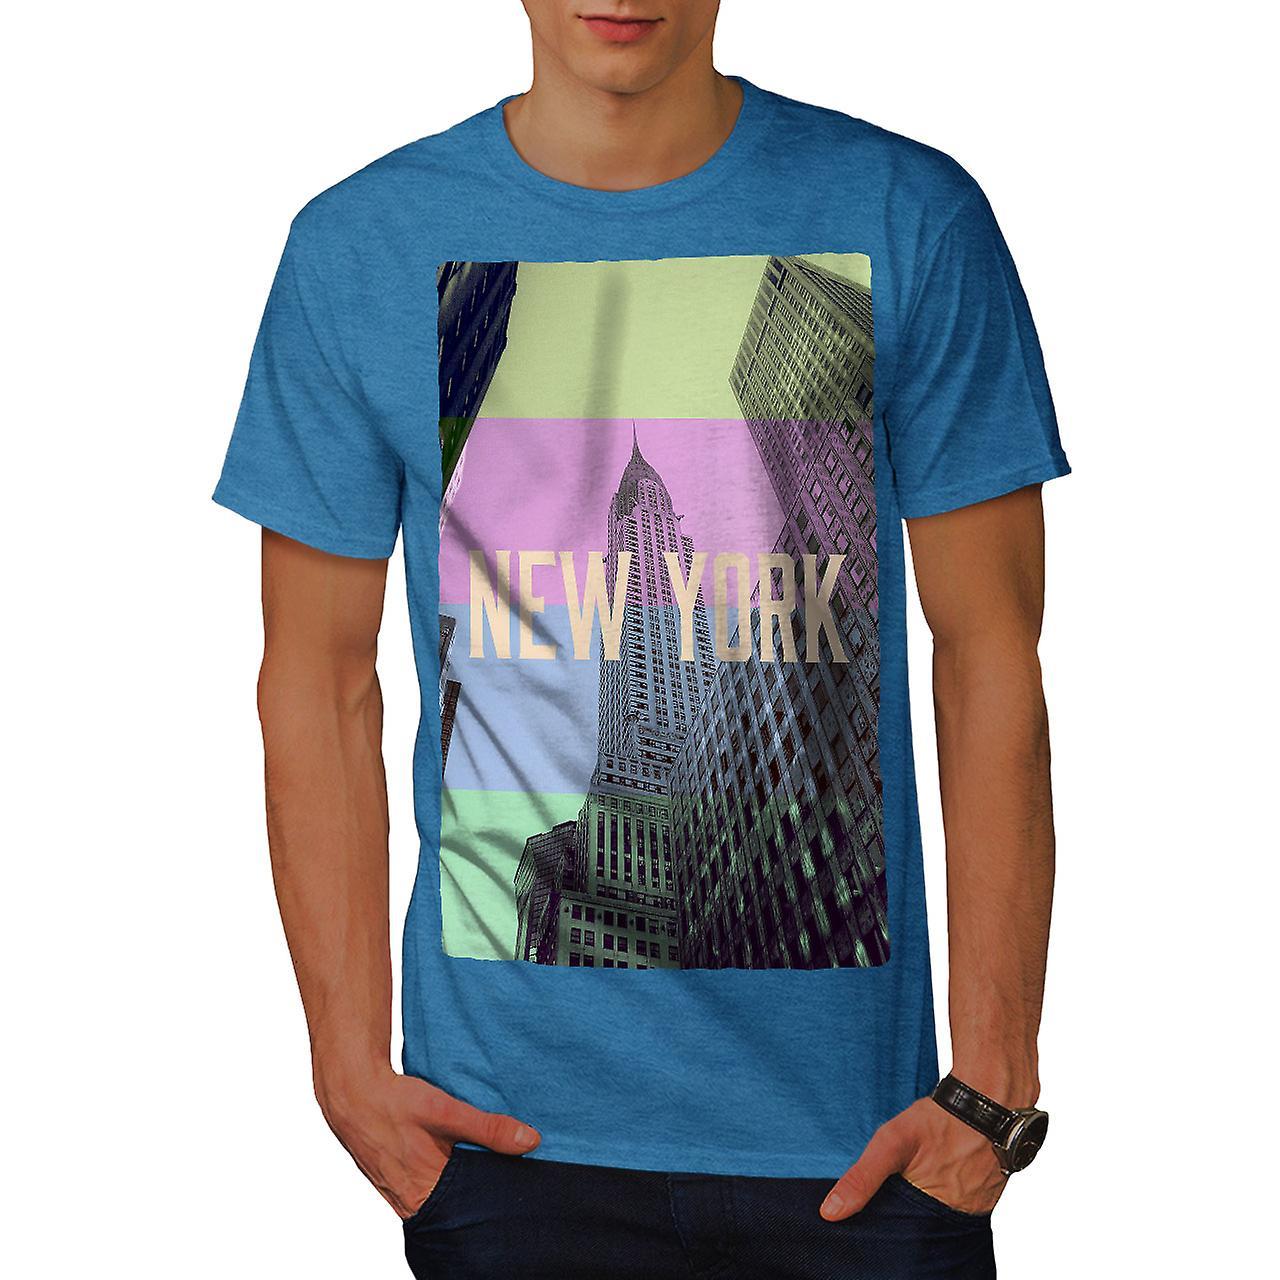 New fashion of shirt 5